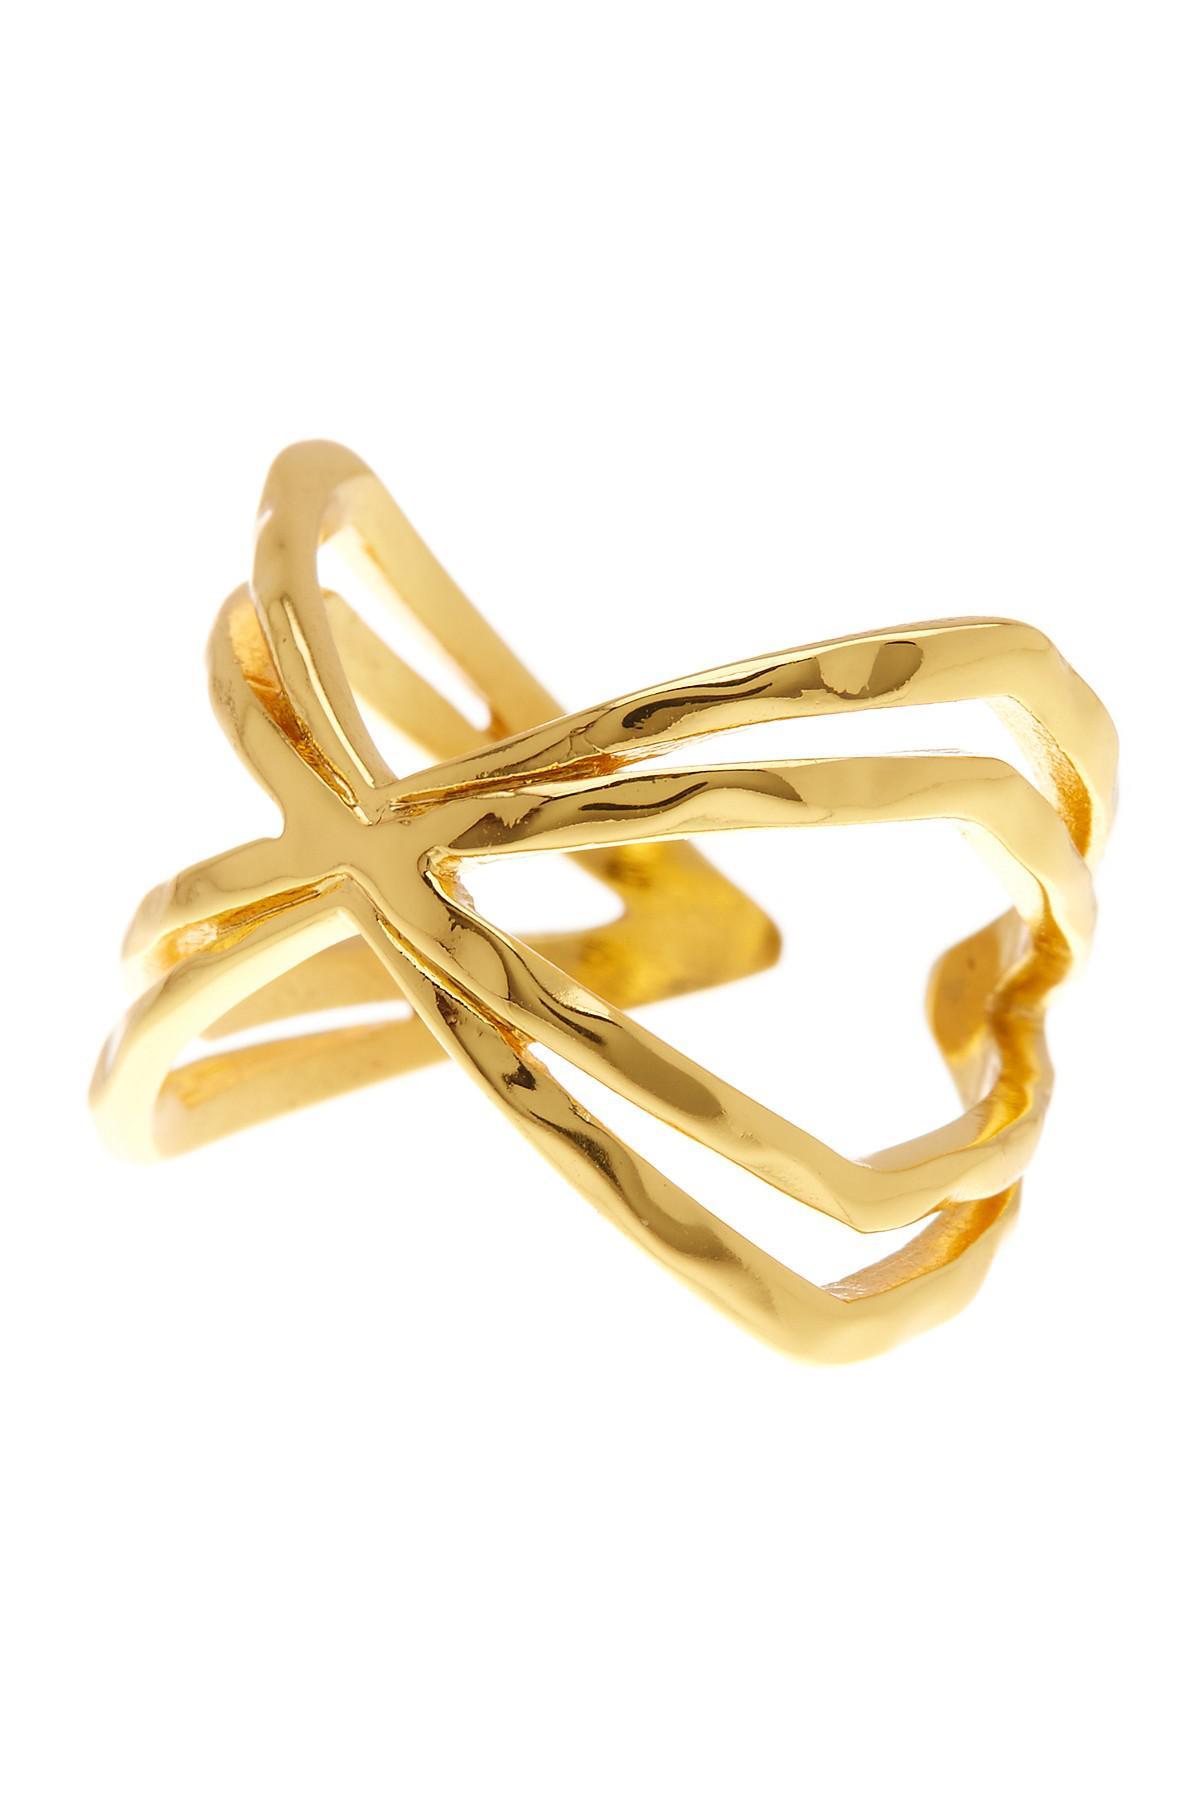 Gorjana Skyler Crisscross Cuff Ring, Size 7